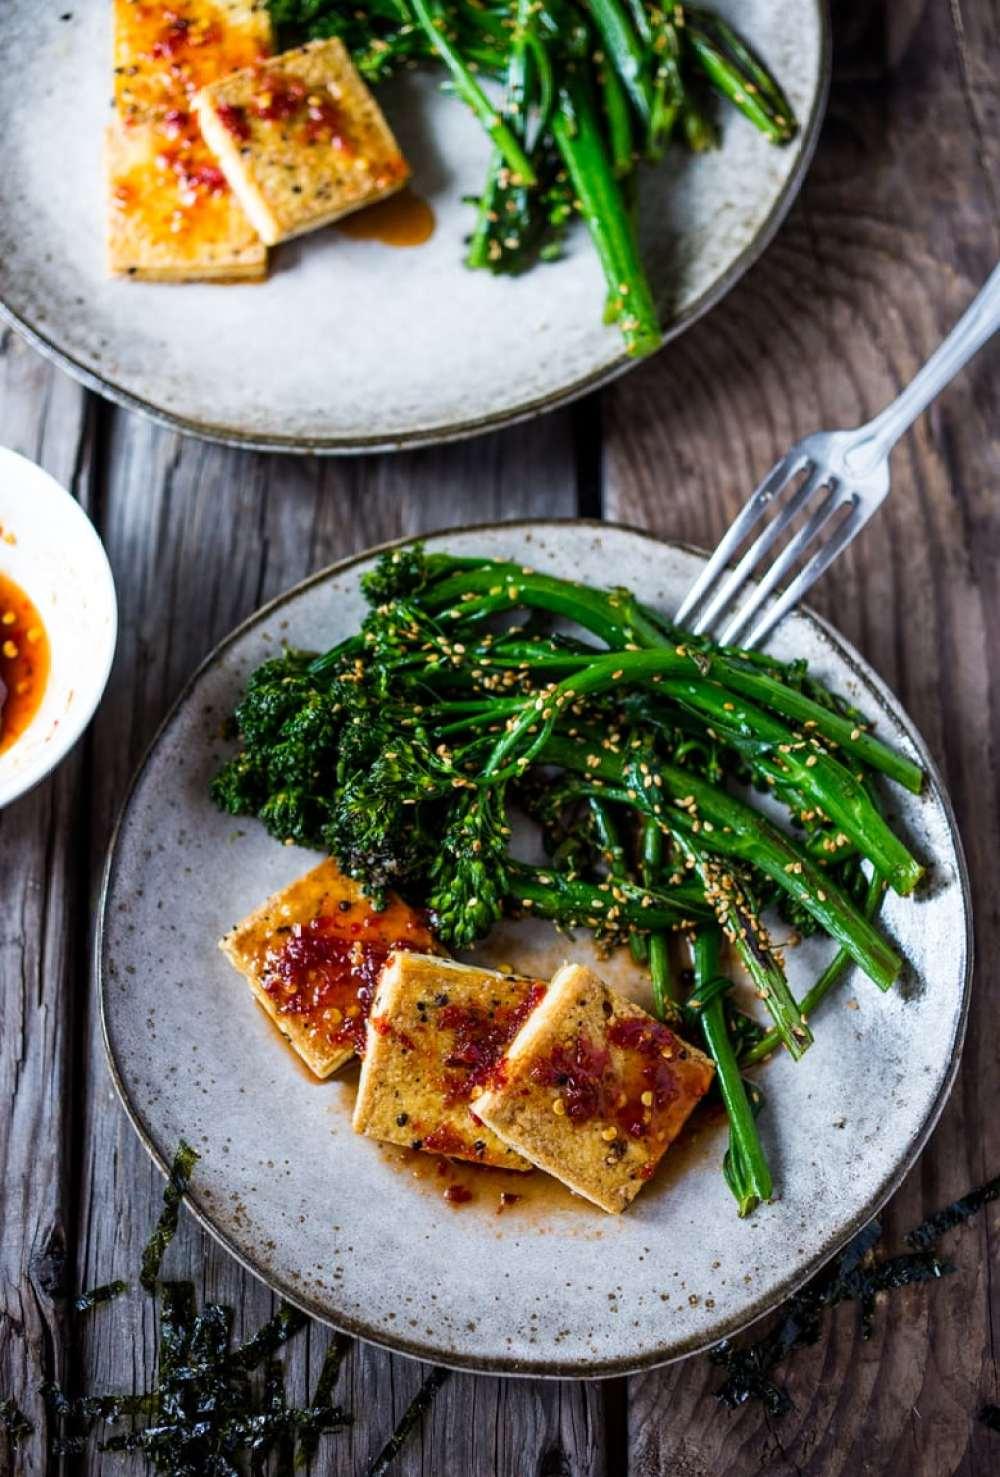 Garlic Chili Tofu with Sesame Broccolini